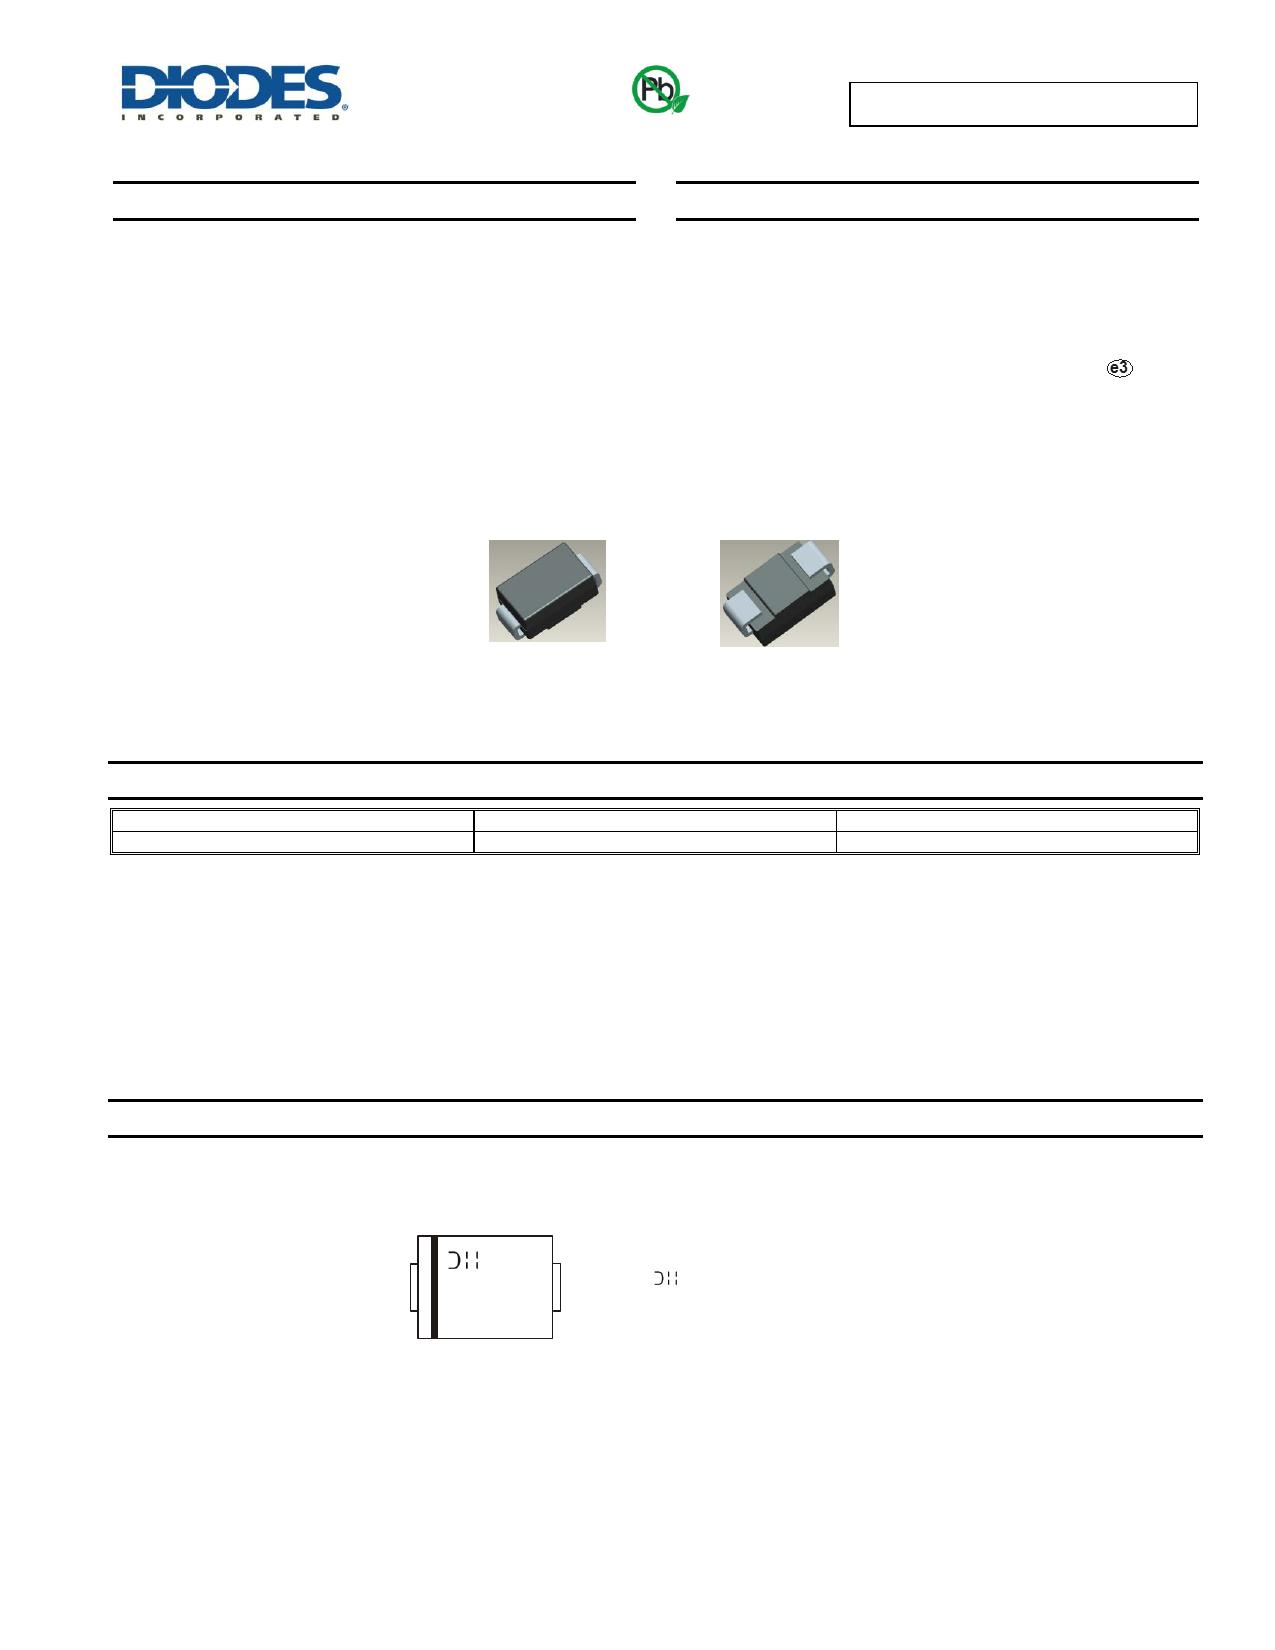 1SMB5914B datasheet